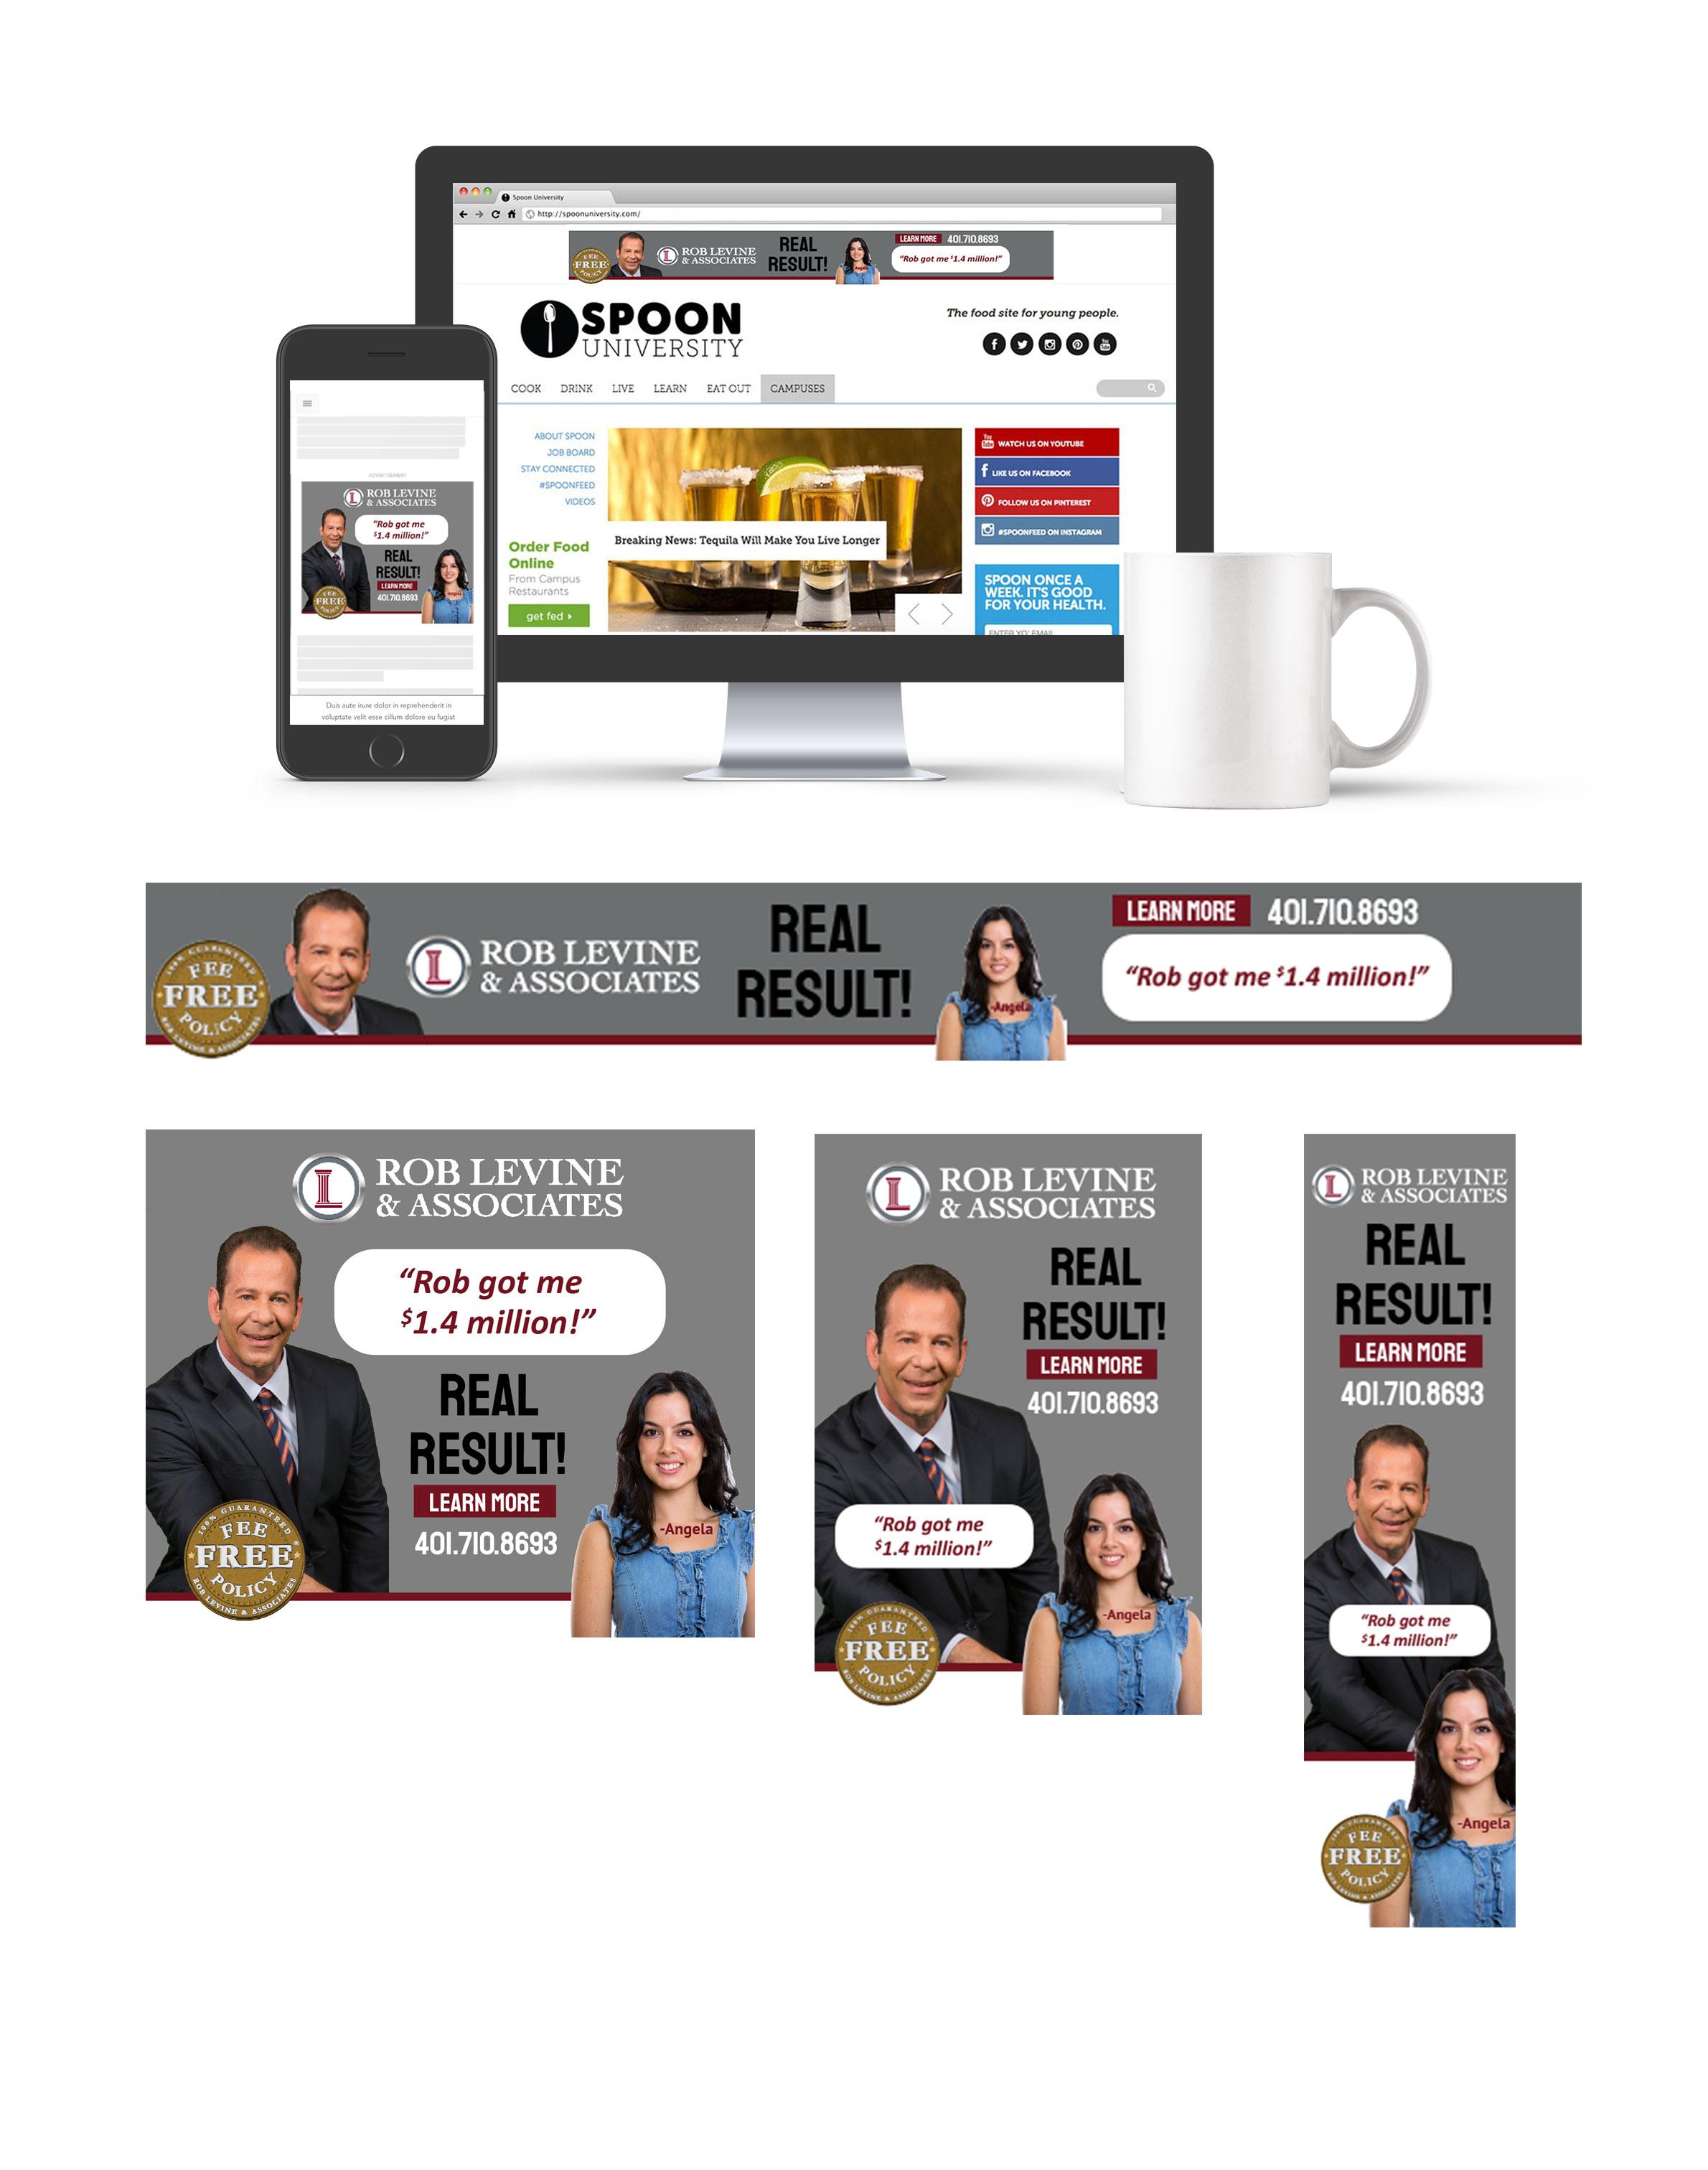 Rob Levine Geofencing Digital Ad Campaign